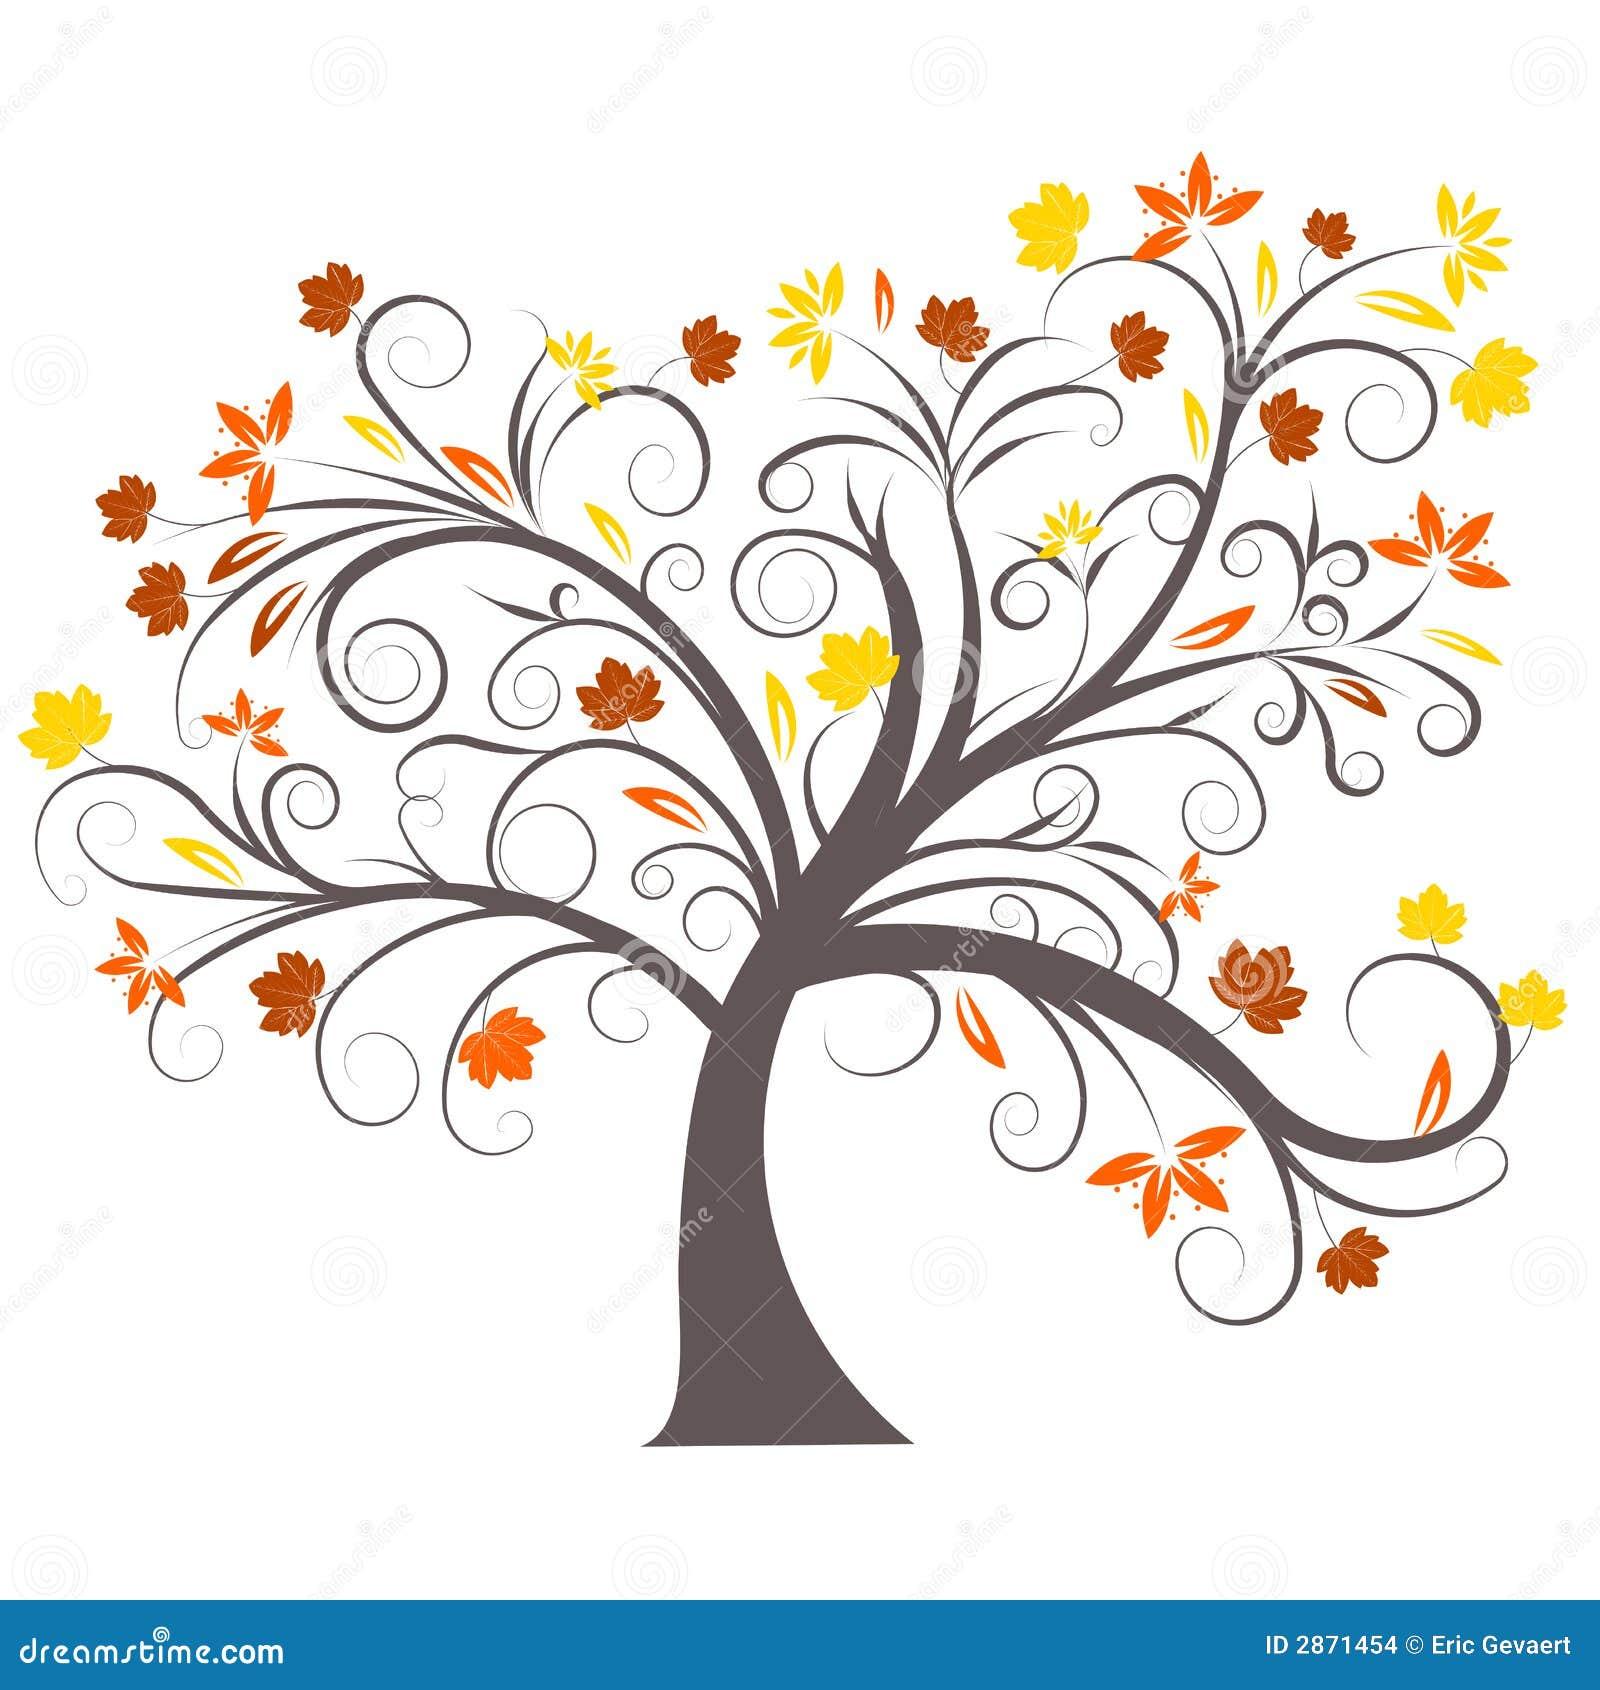 vector autumn tree design stock vector illustration of. Black Bedroom Furniture Sets. Home Design Ideas